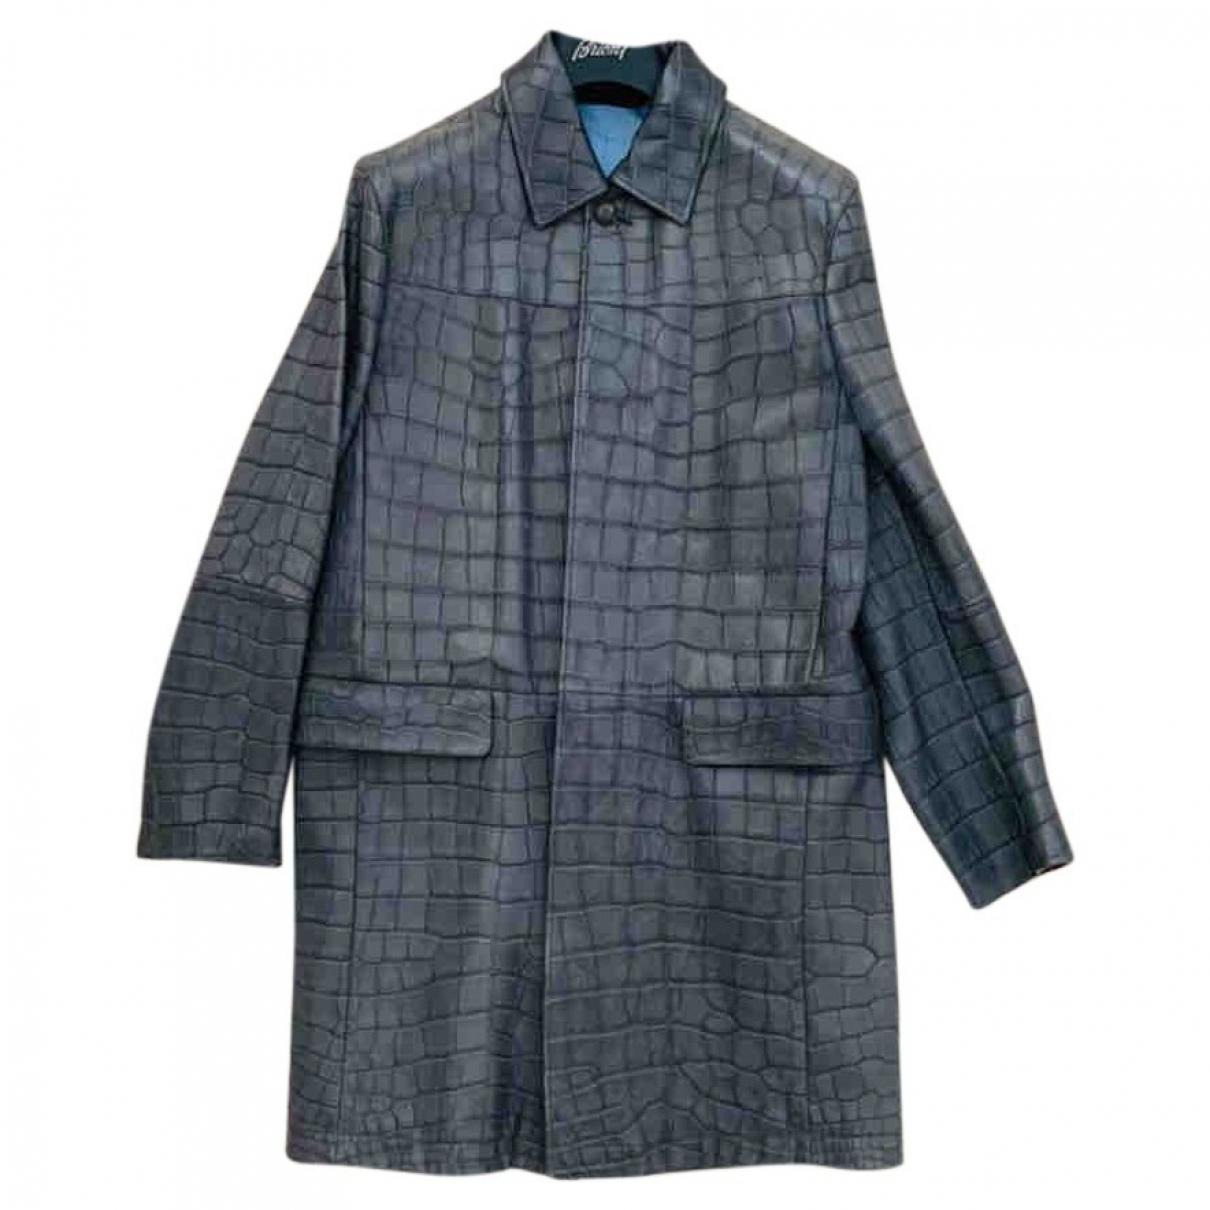 Brioni \N Grey Crocodile coat  for Men 50 IT